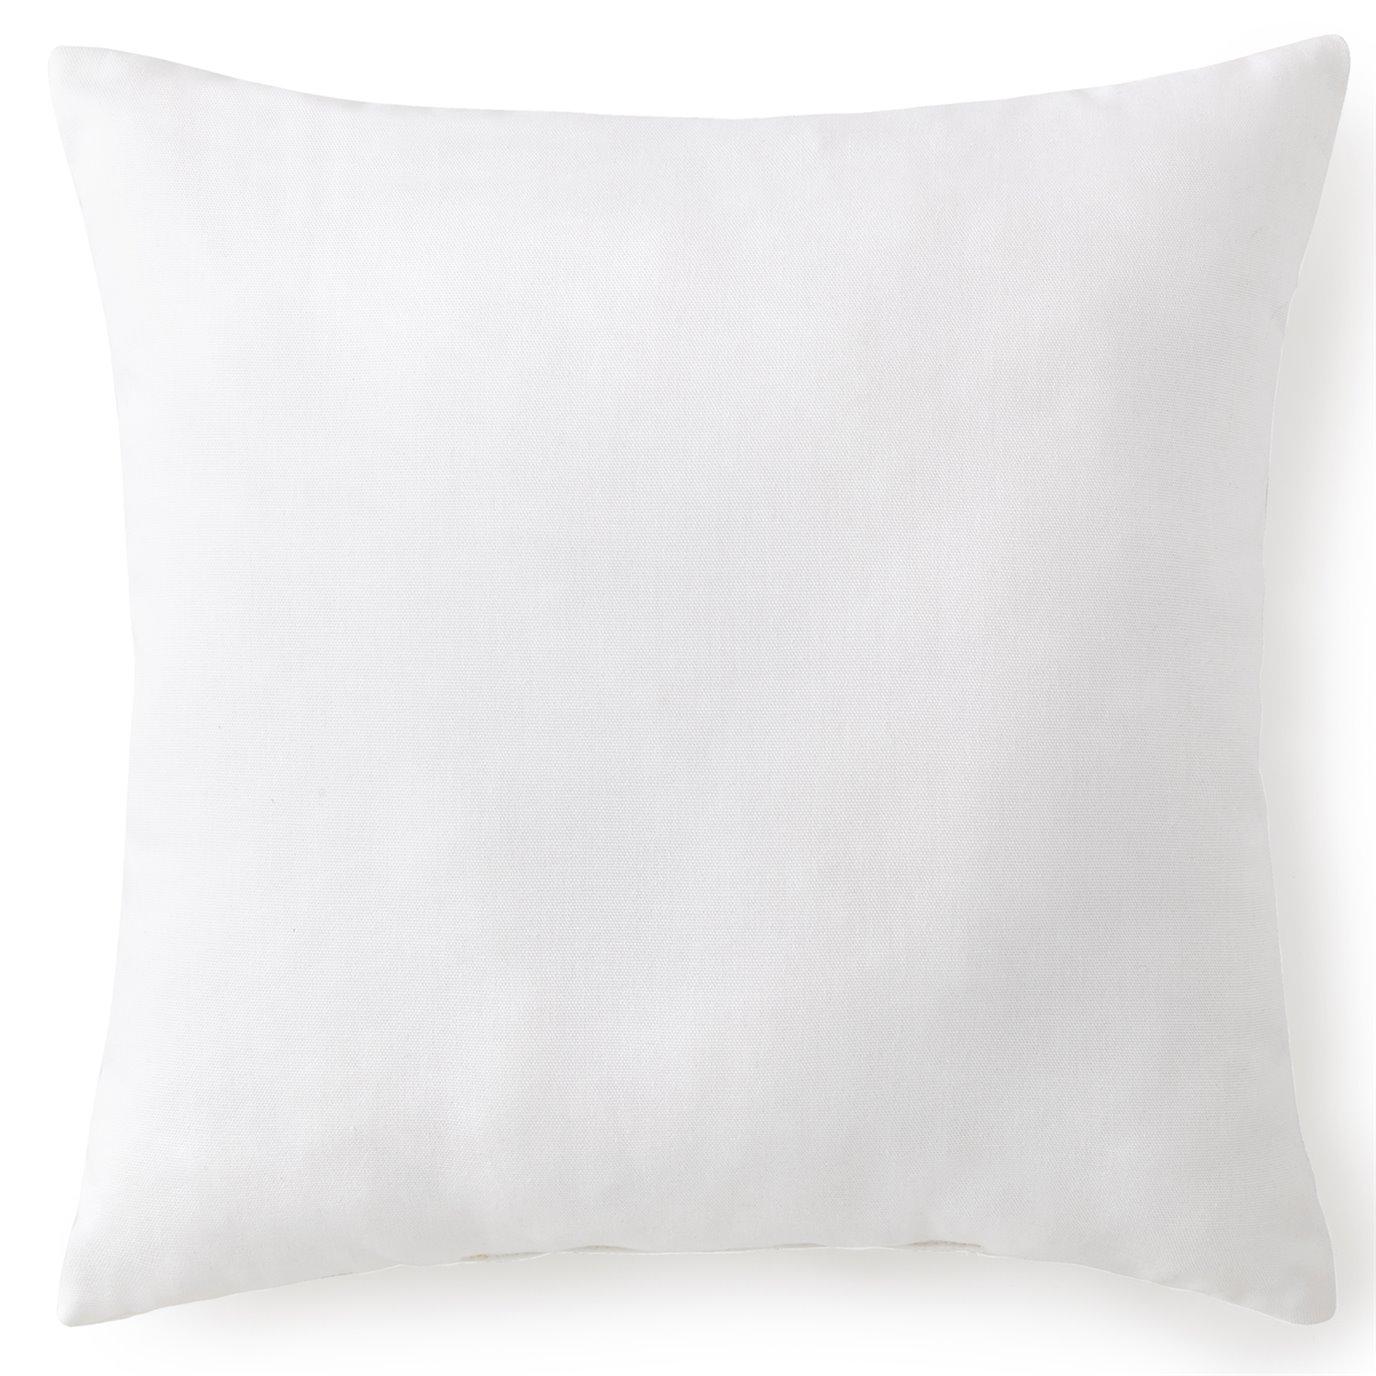 "Flamingo Palms Square Cushion 18""x18"" - Solid White"